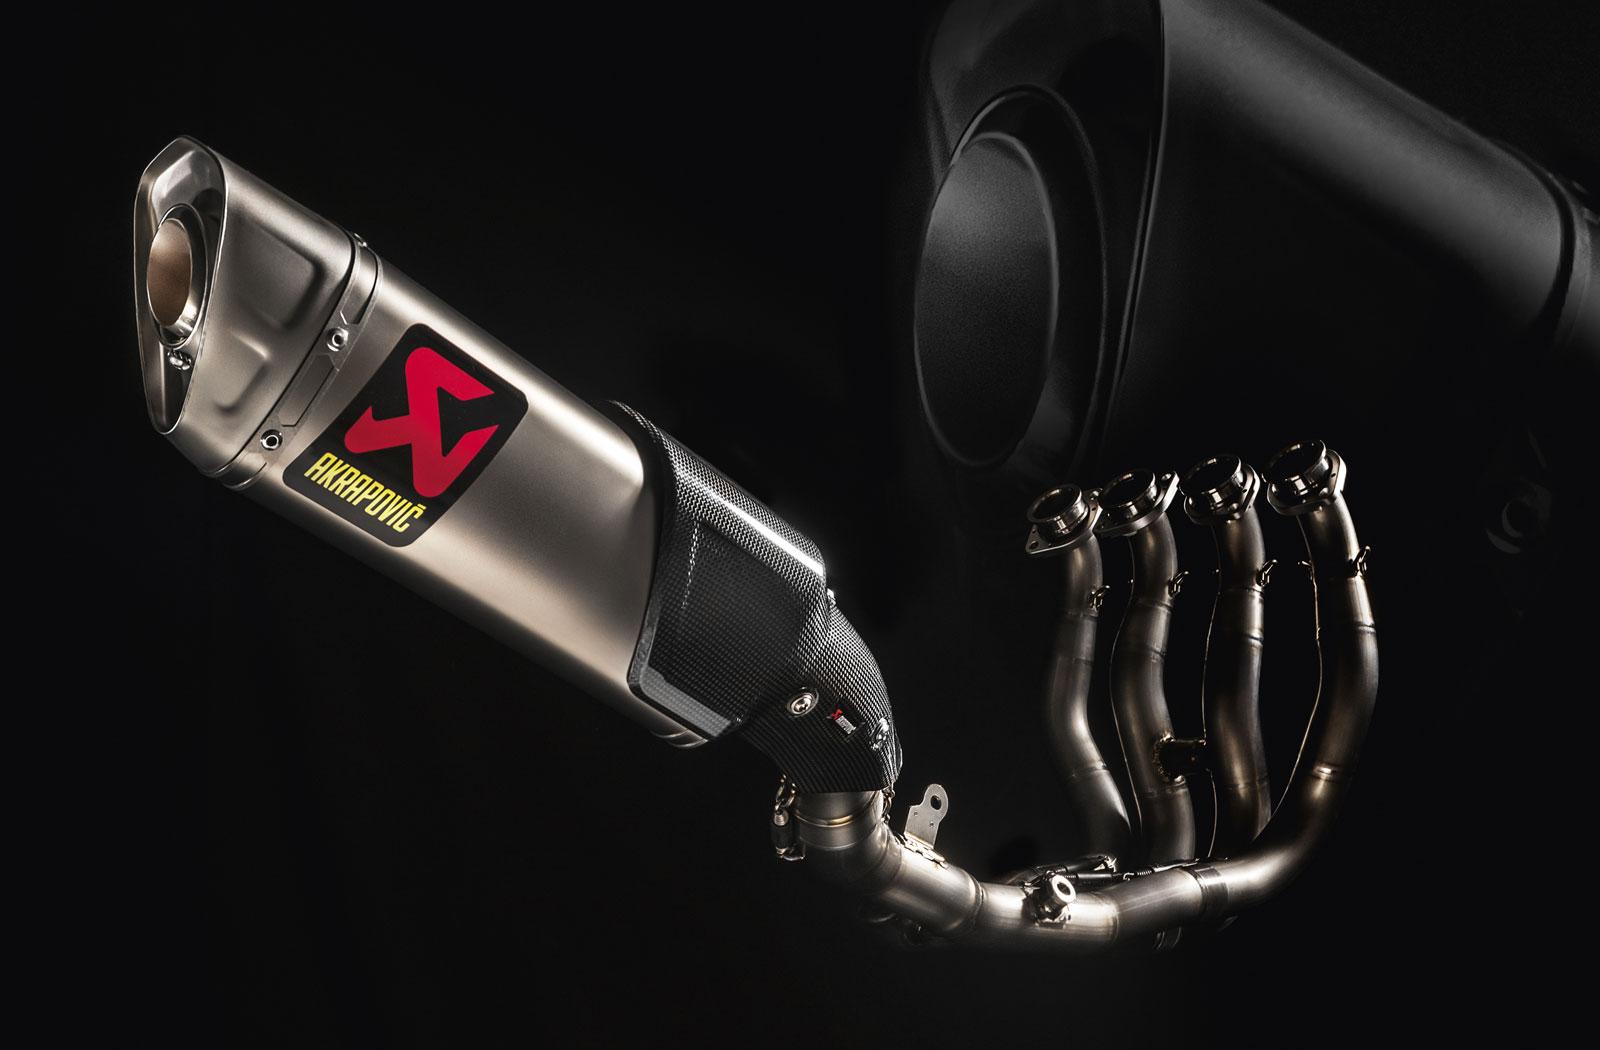 Akrapovic performance exhaust system